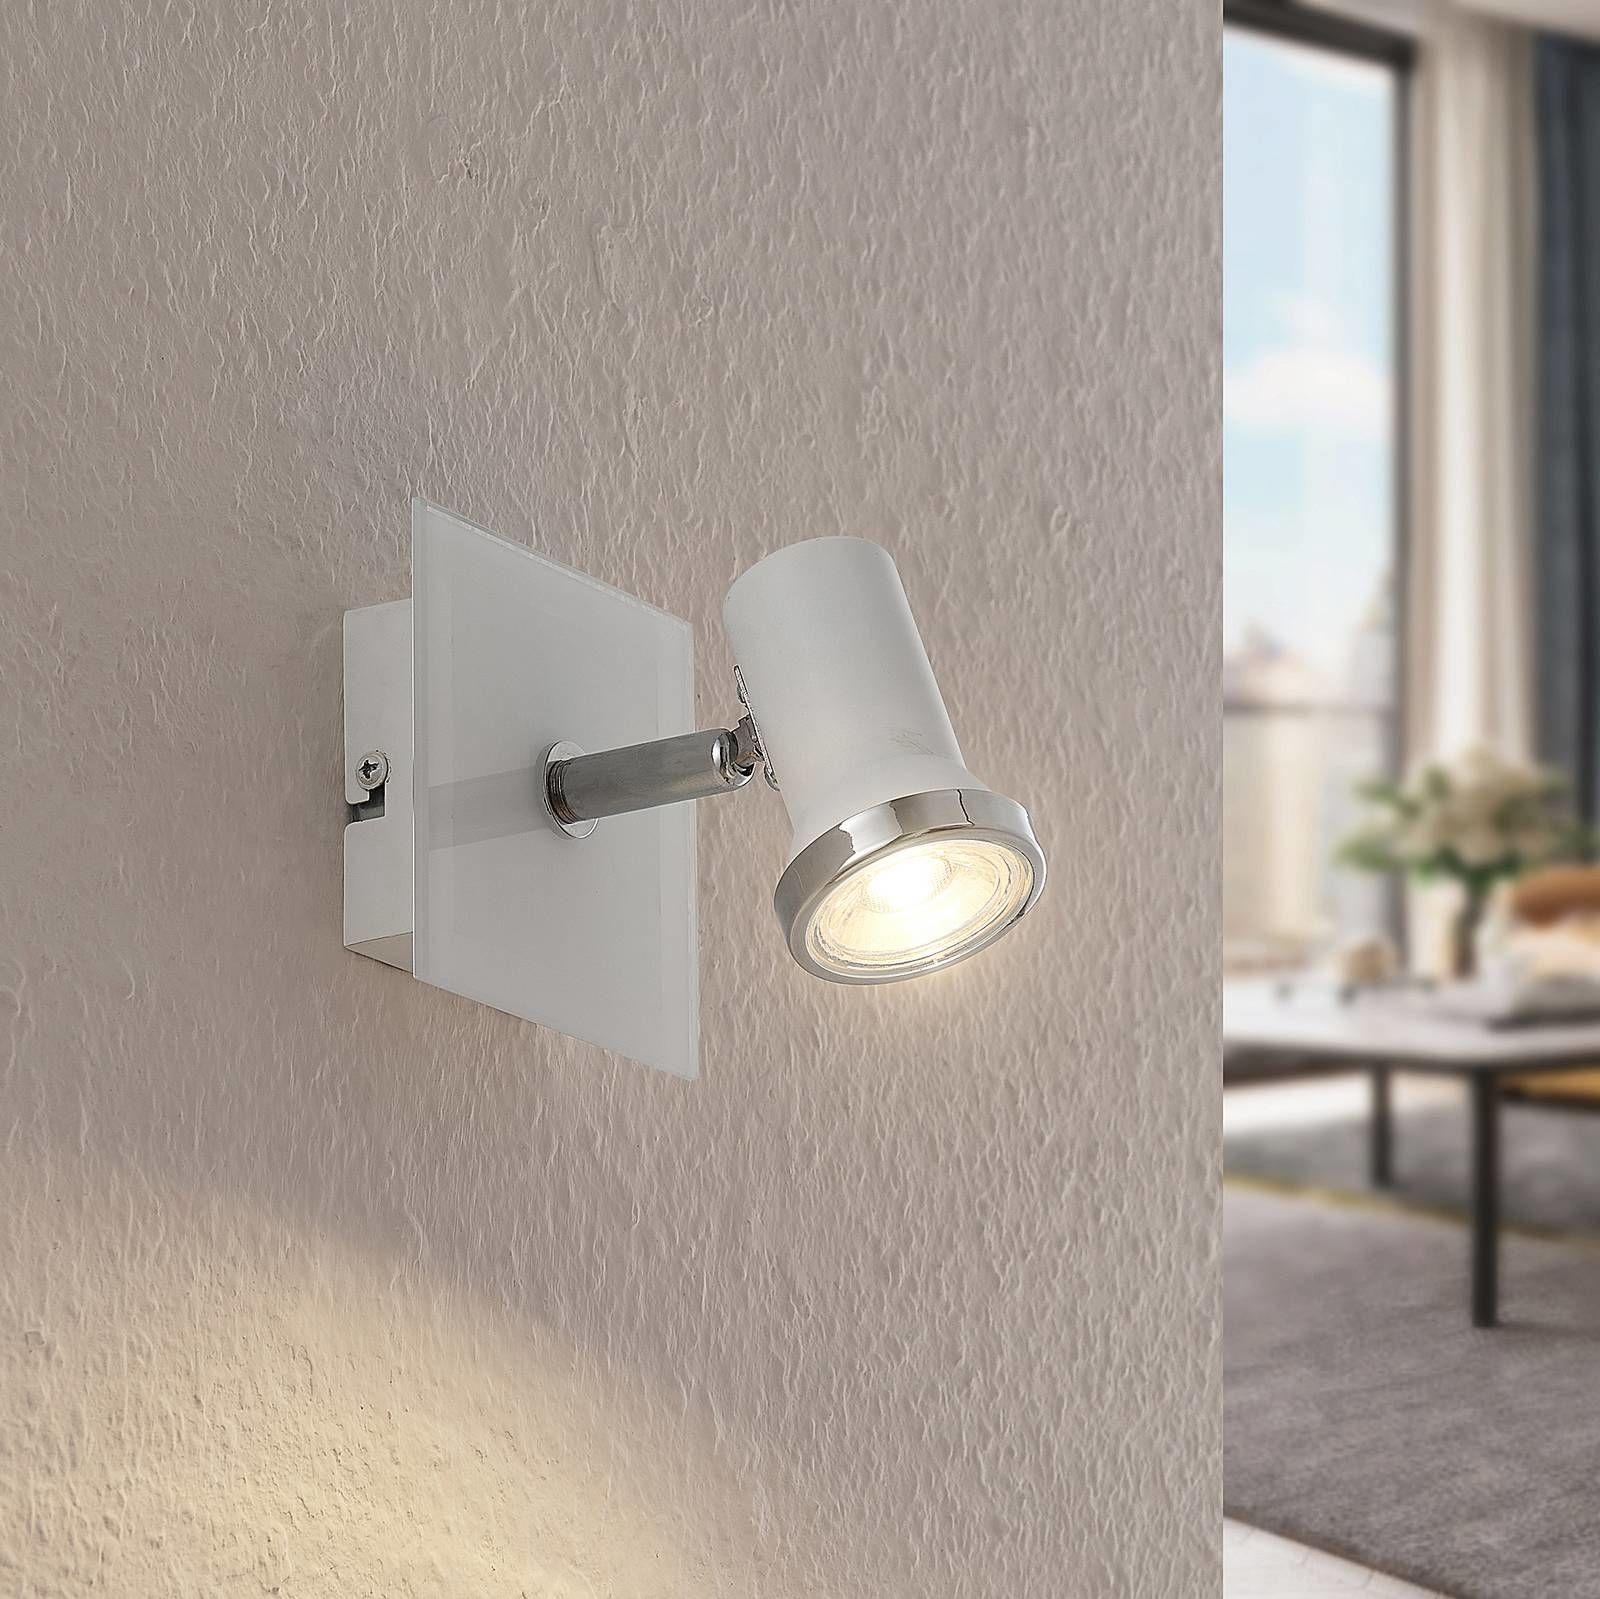 Lindby Marvolo lampa ścienna, biała, 1-punktowa